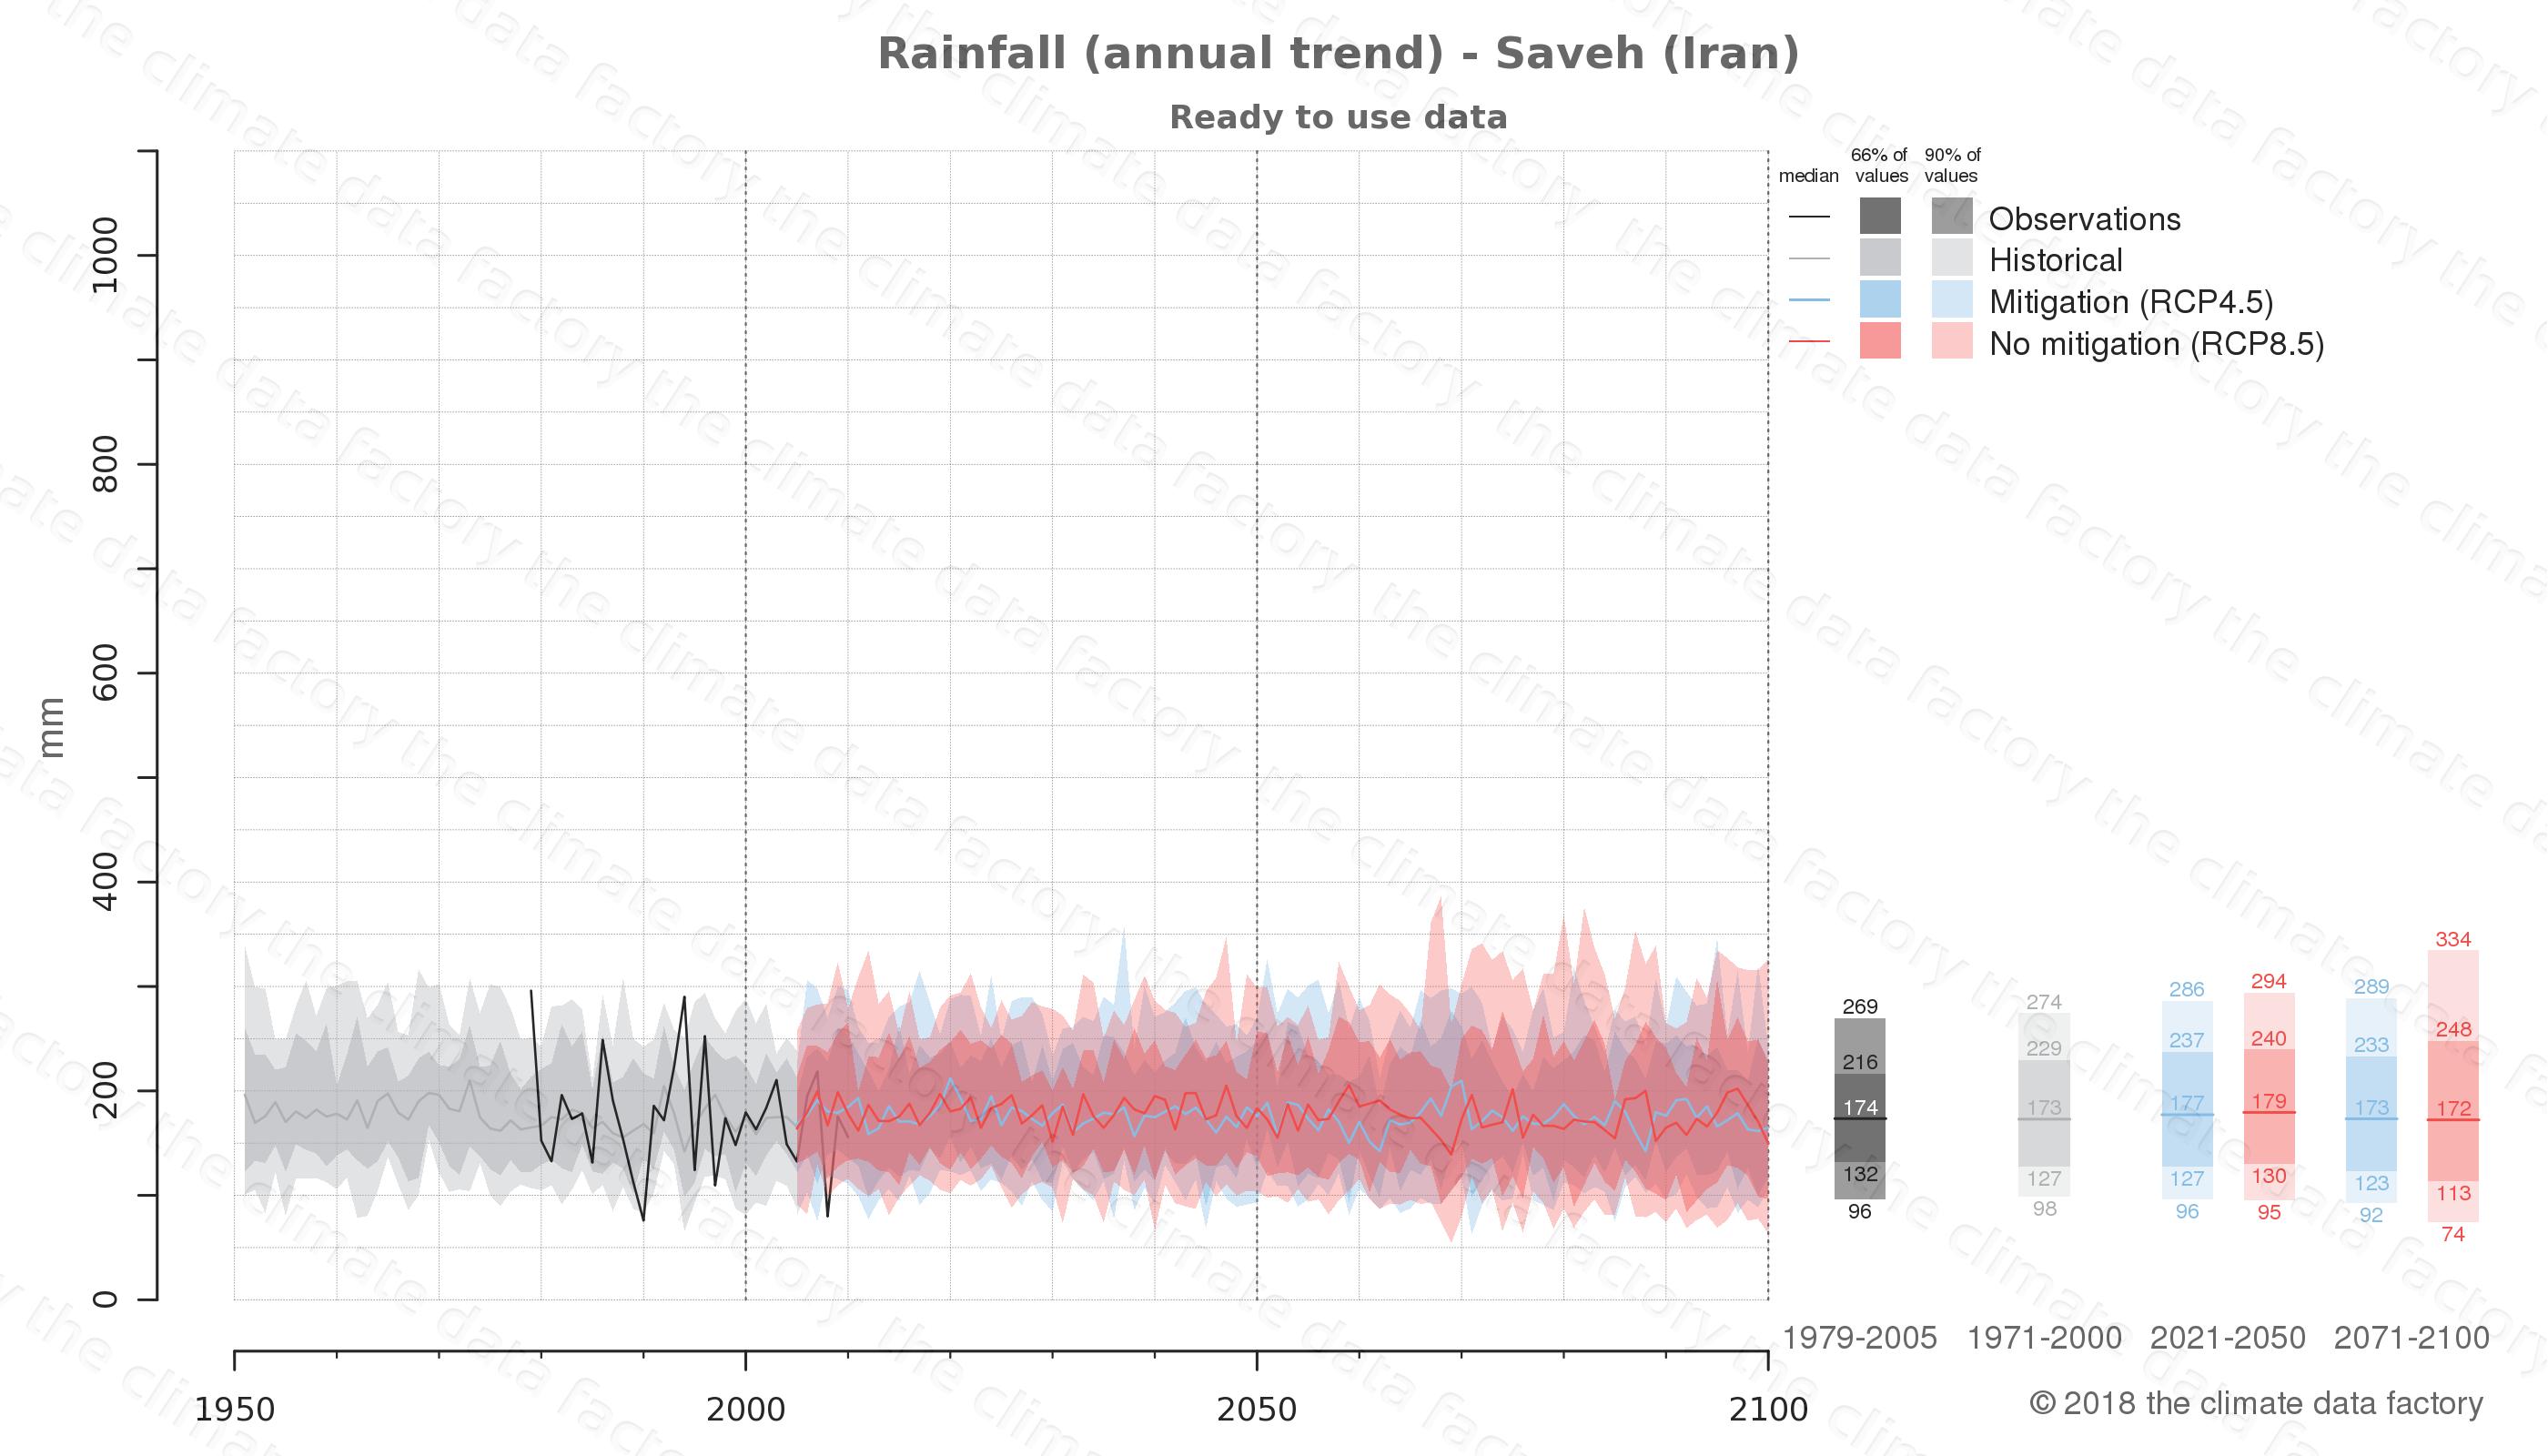 climate change data policy adaptation climate graph city data rainfall saveh iran